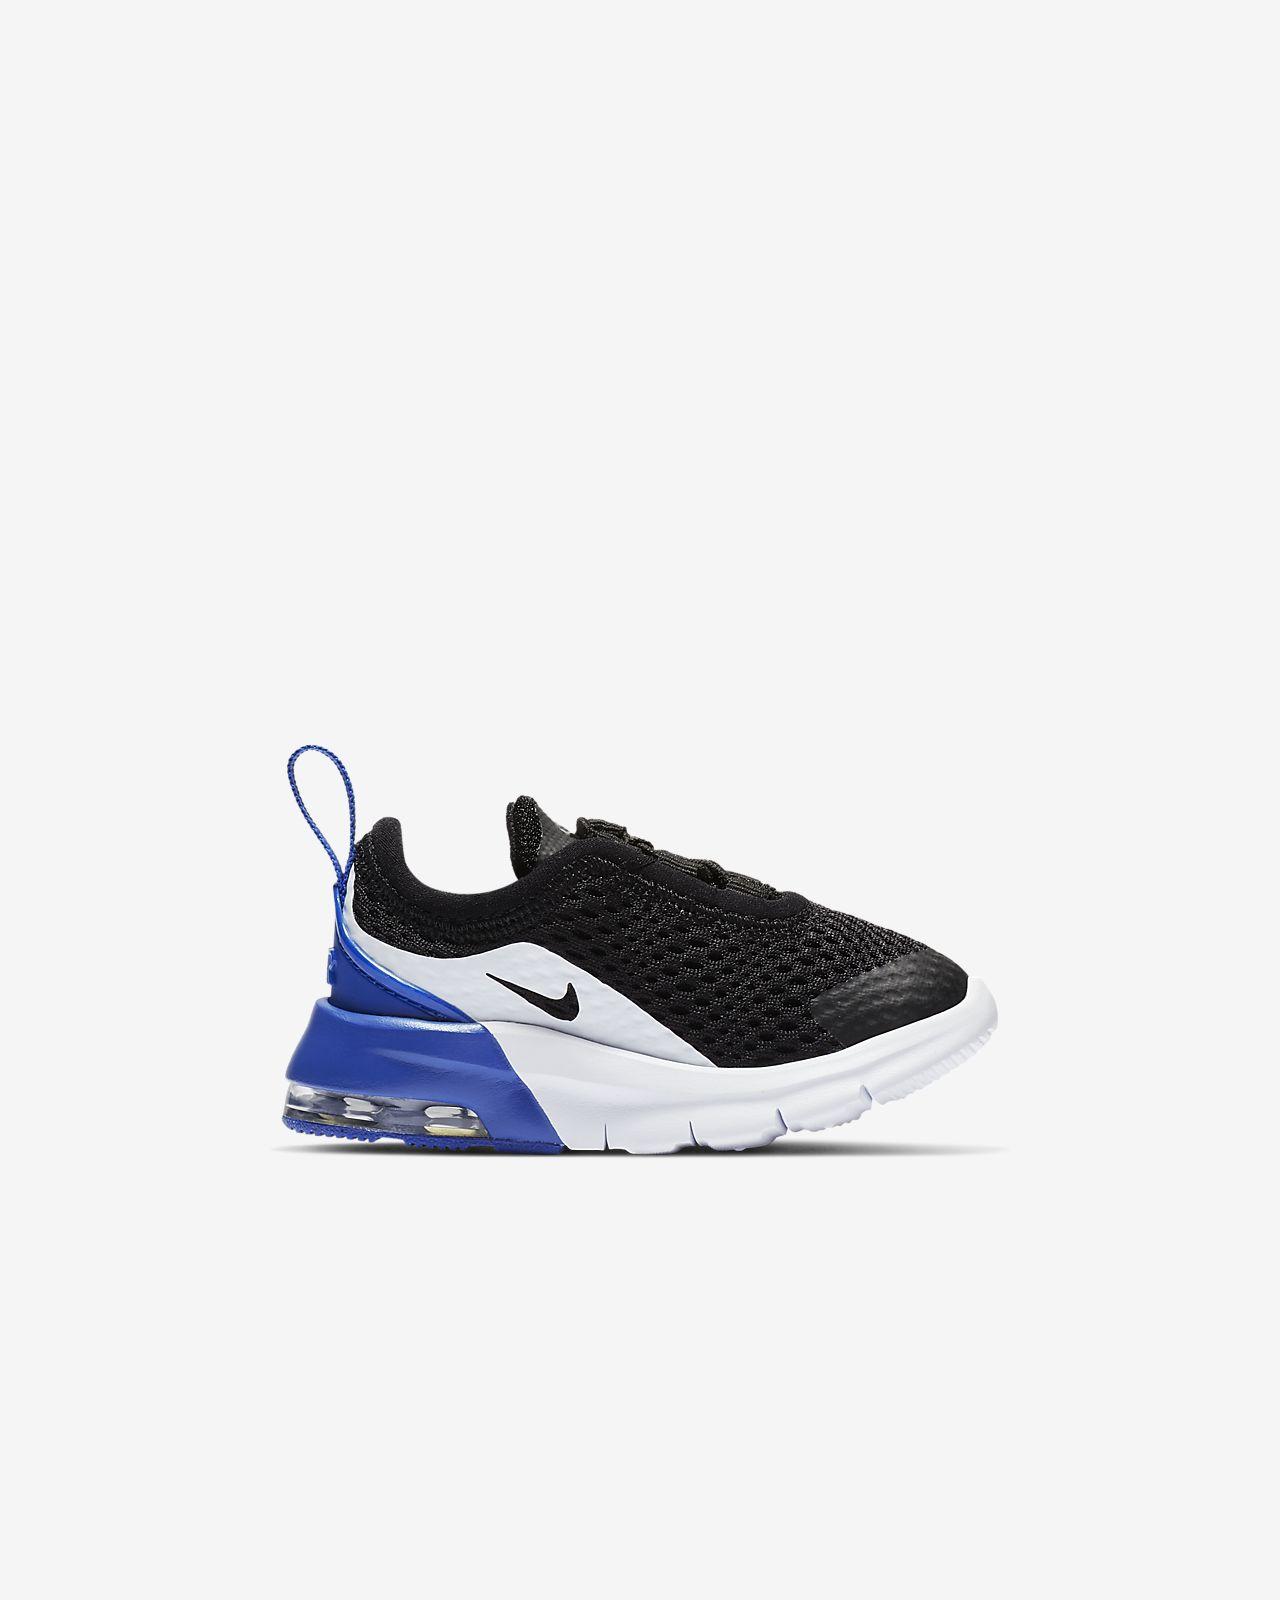 Nike Air Max Motion 2 InfantToddler Shoe